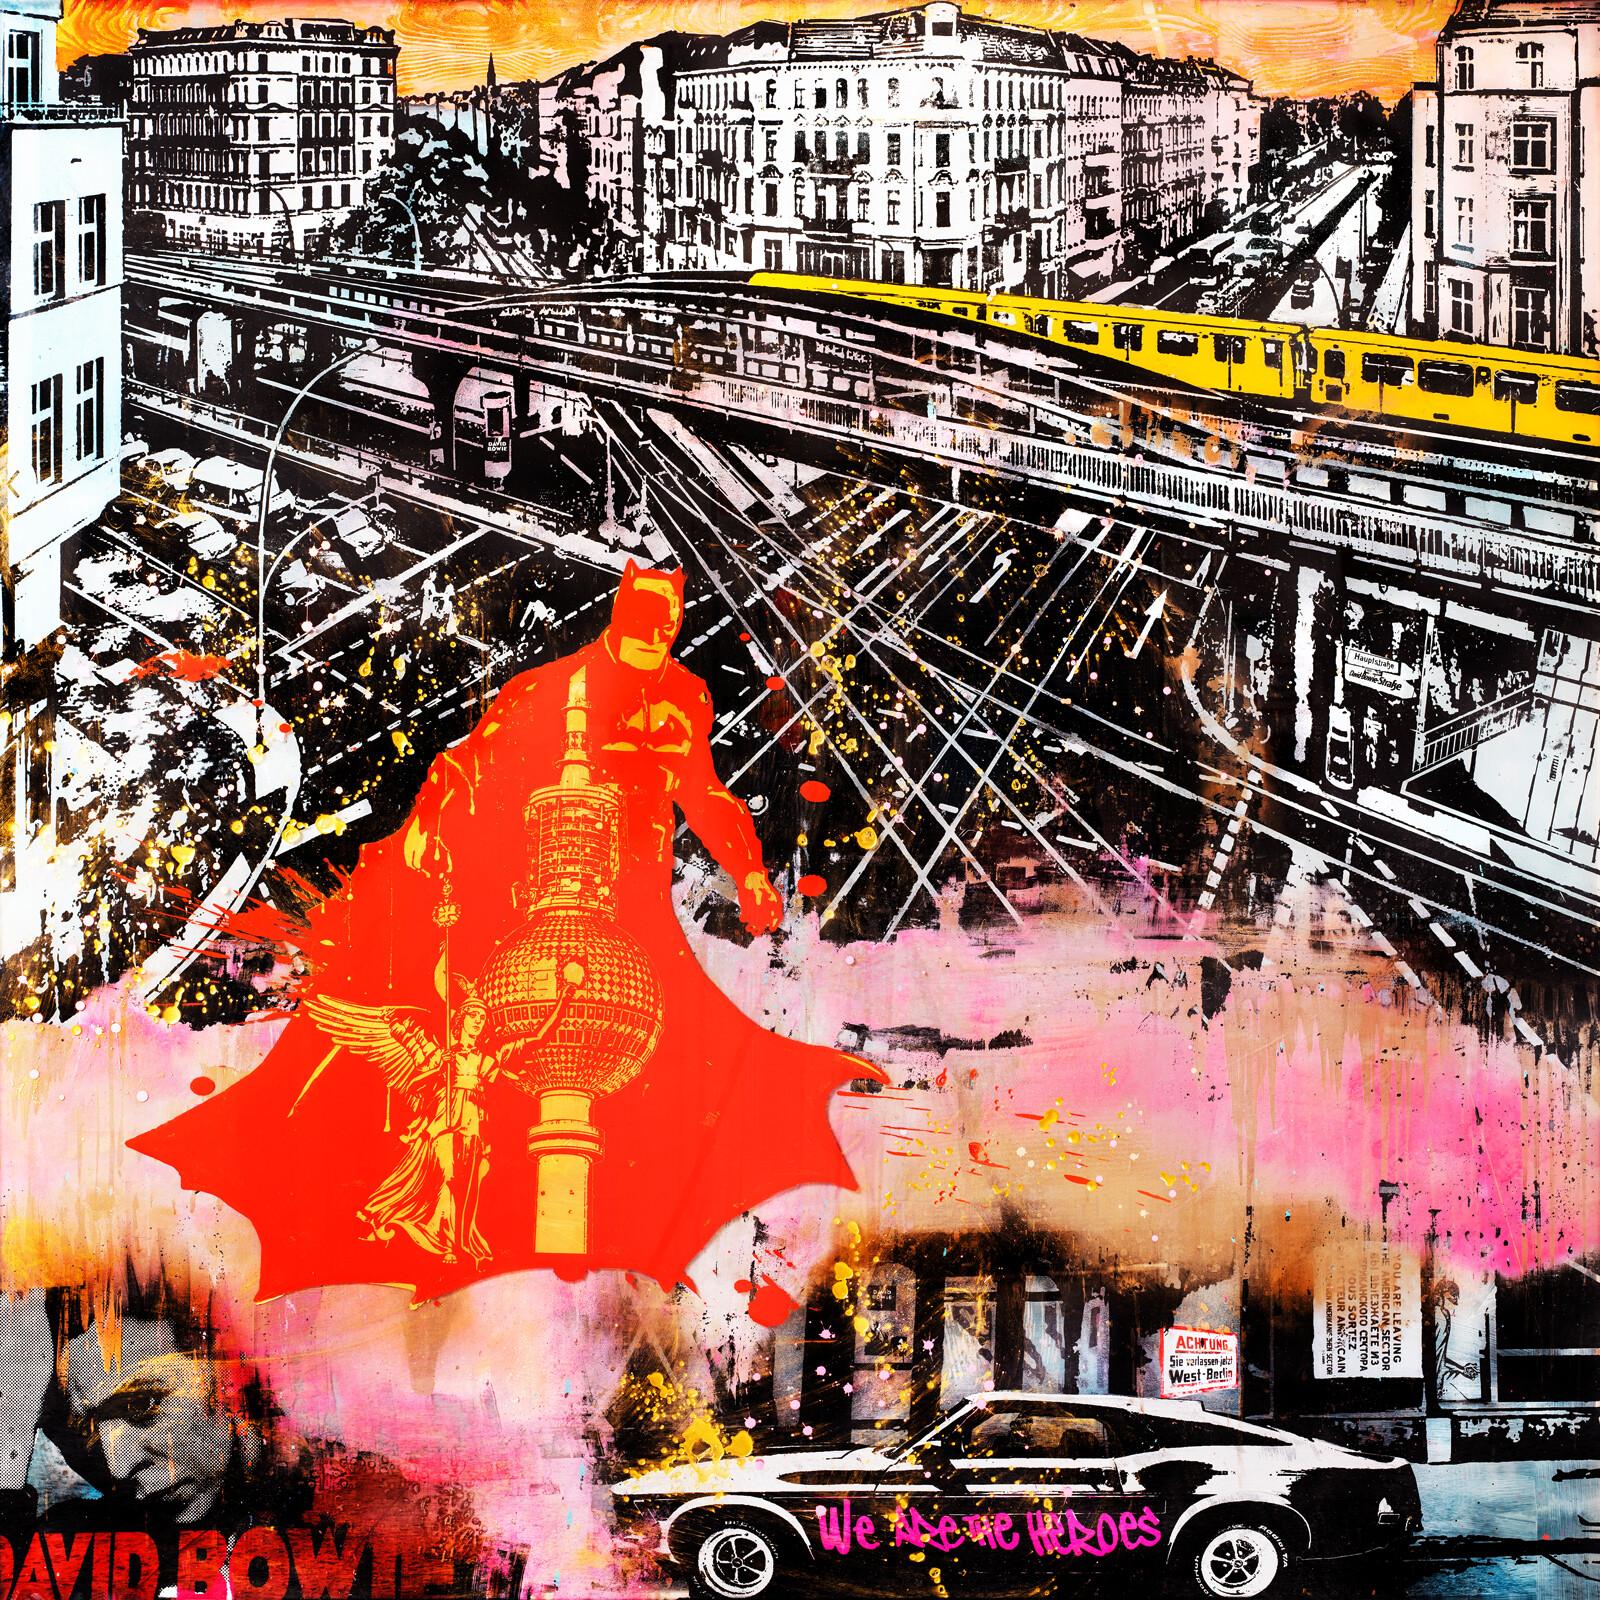 Berlin loves Bowie - Sandra Rauch